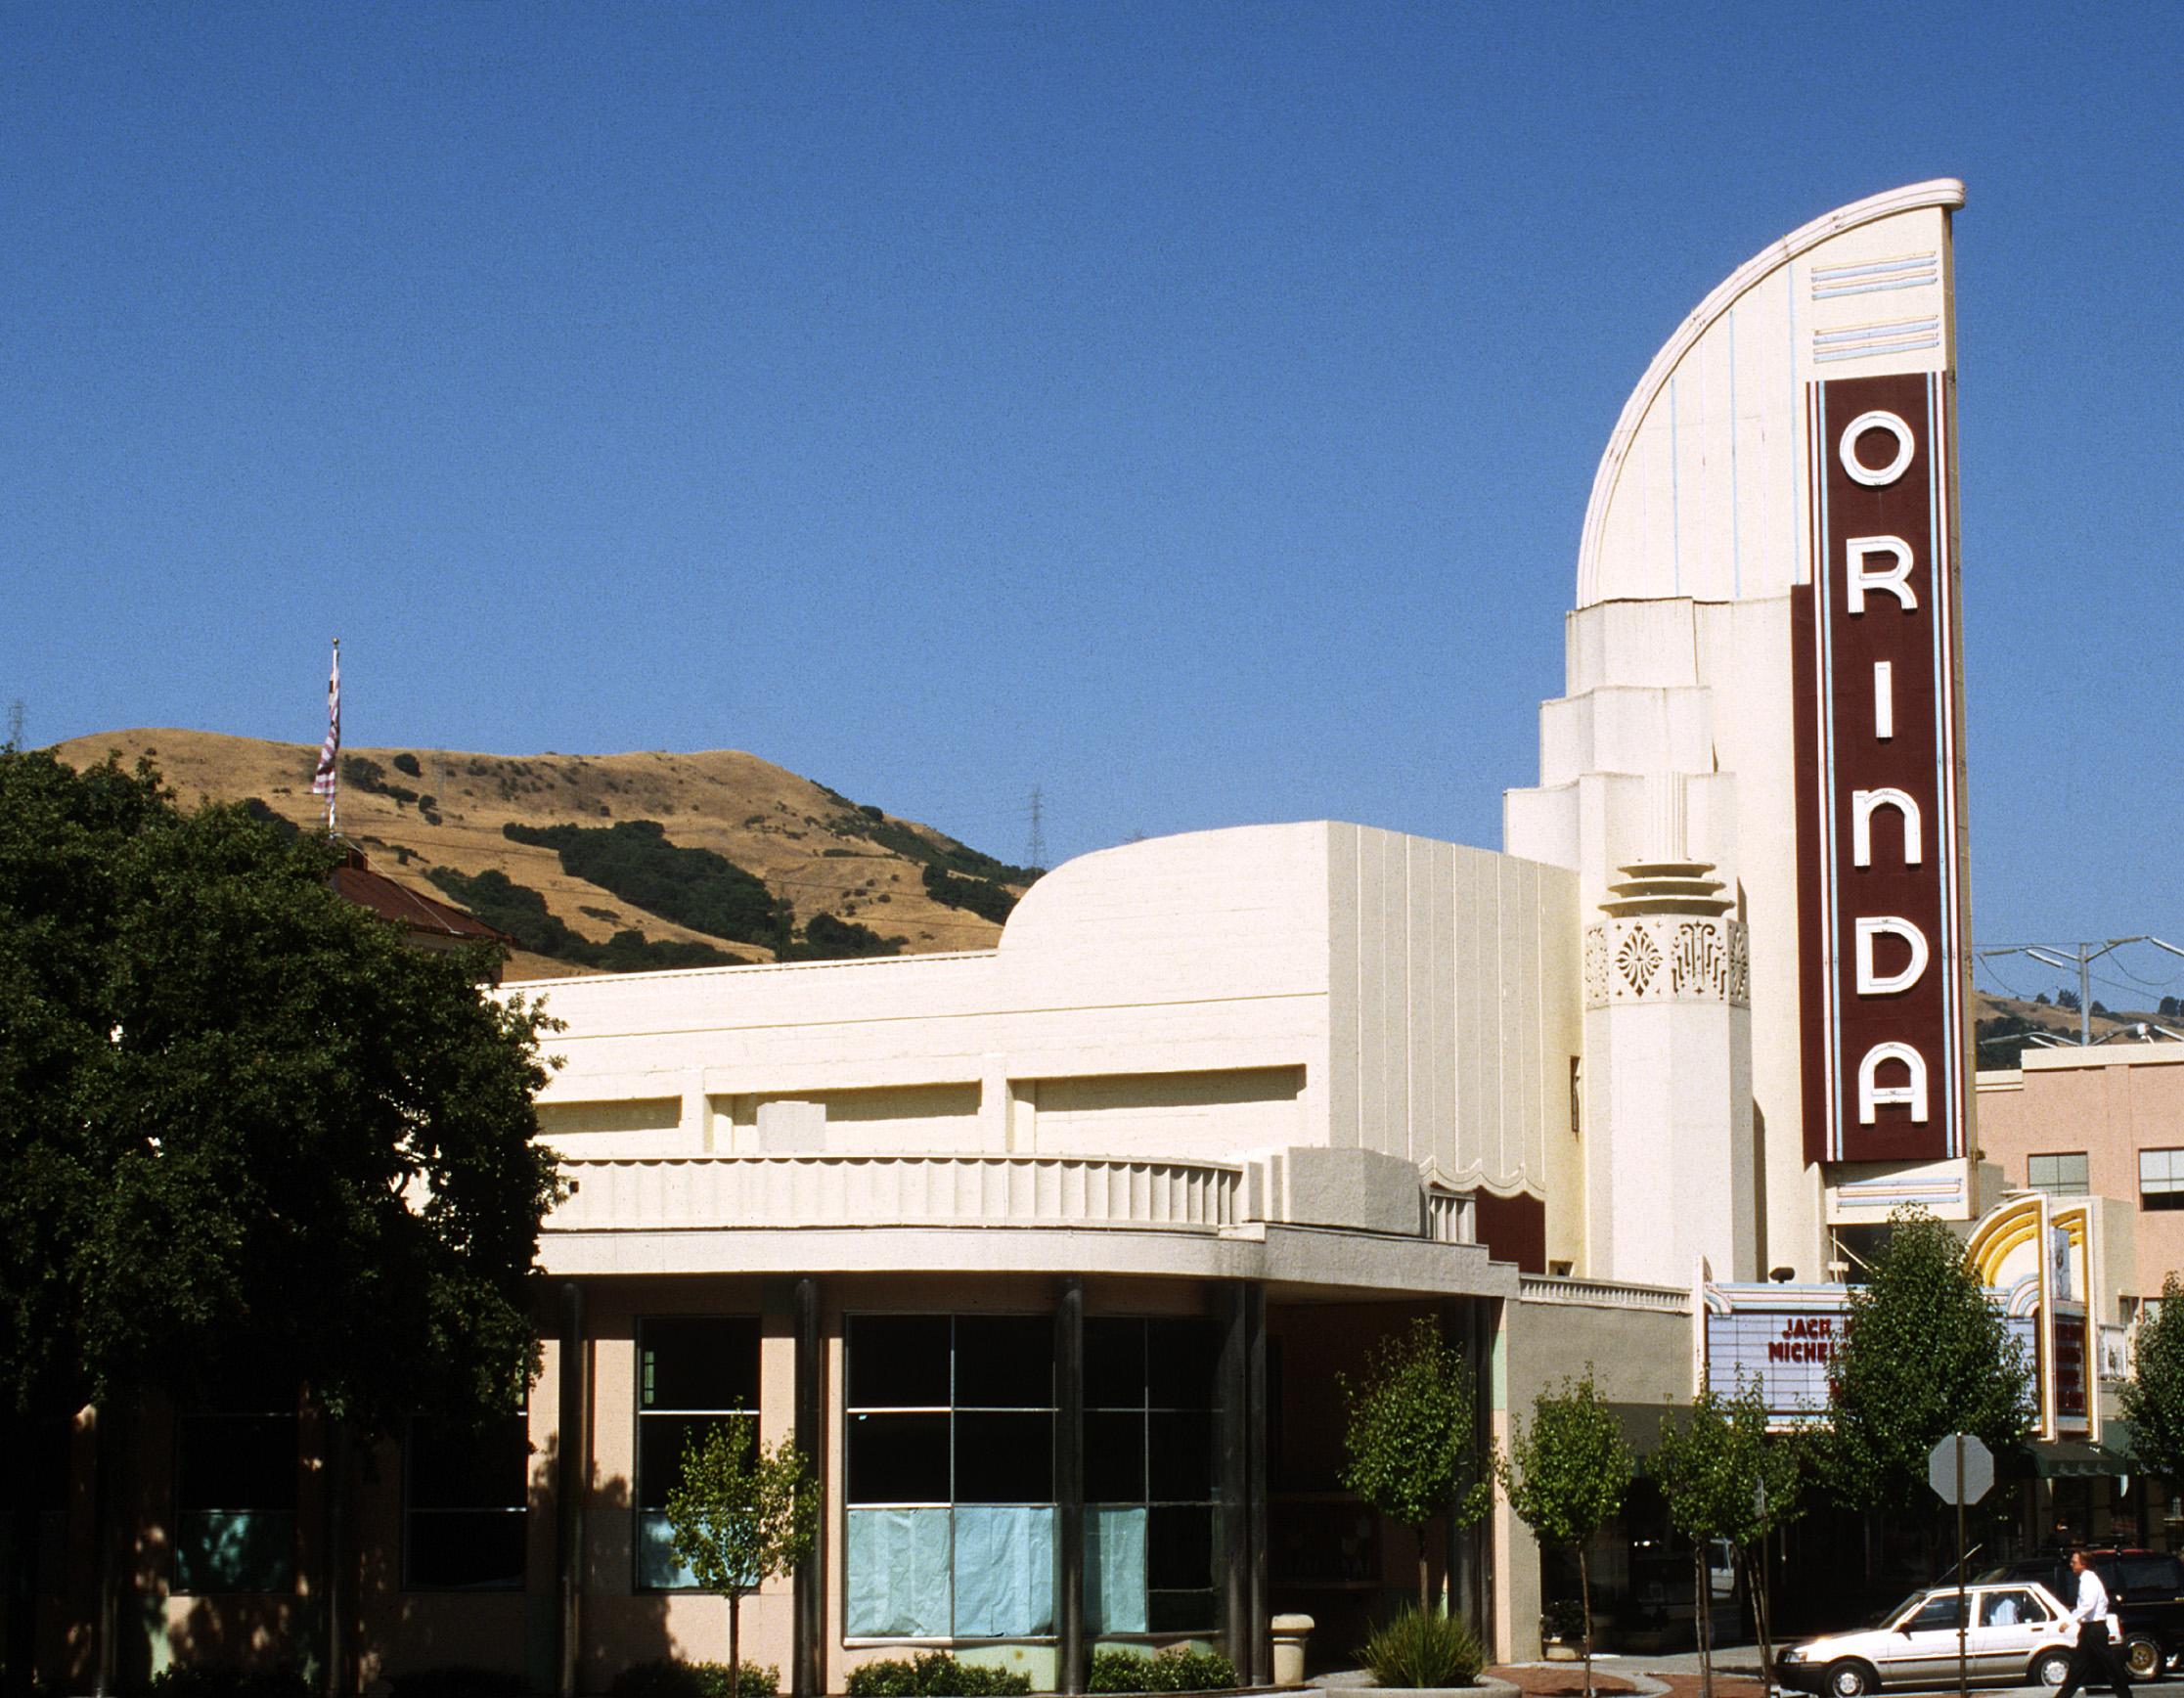 ORINDA THEATER, ORINDA CA.